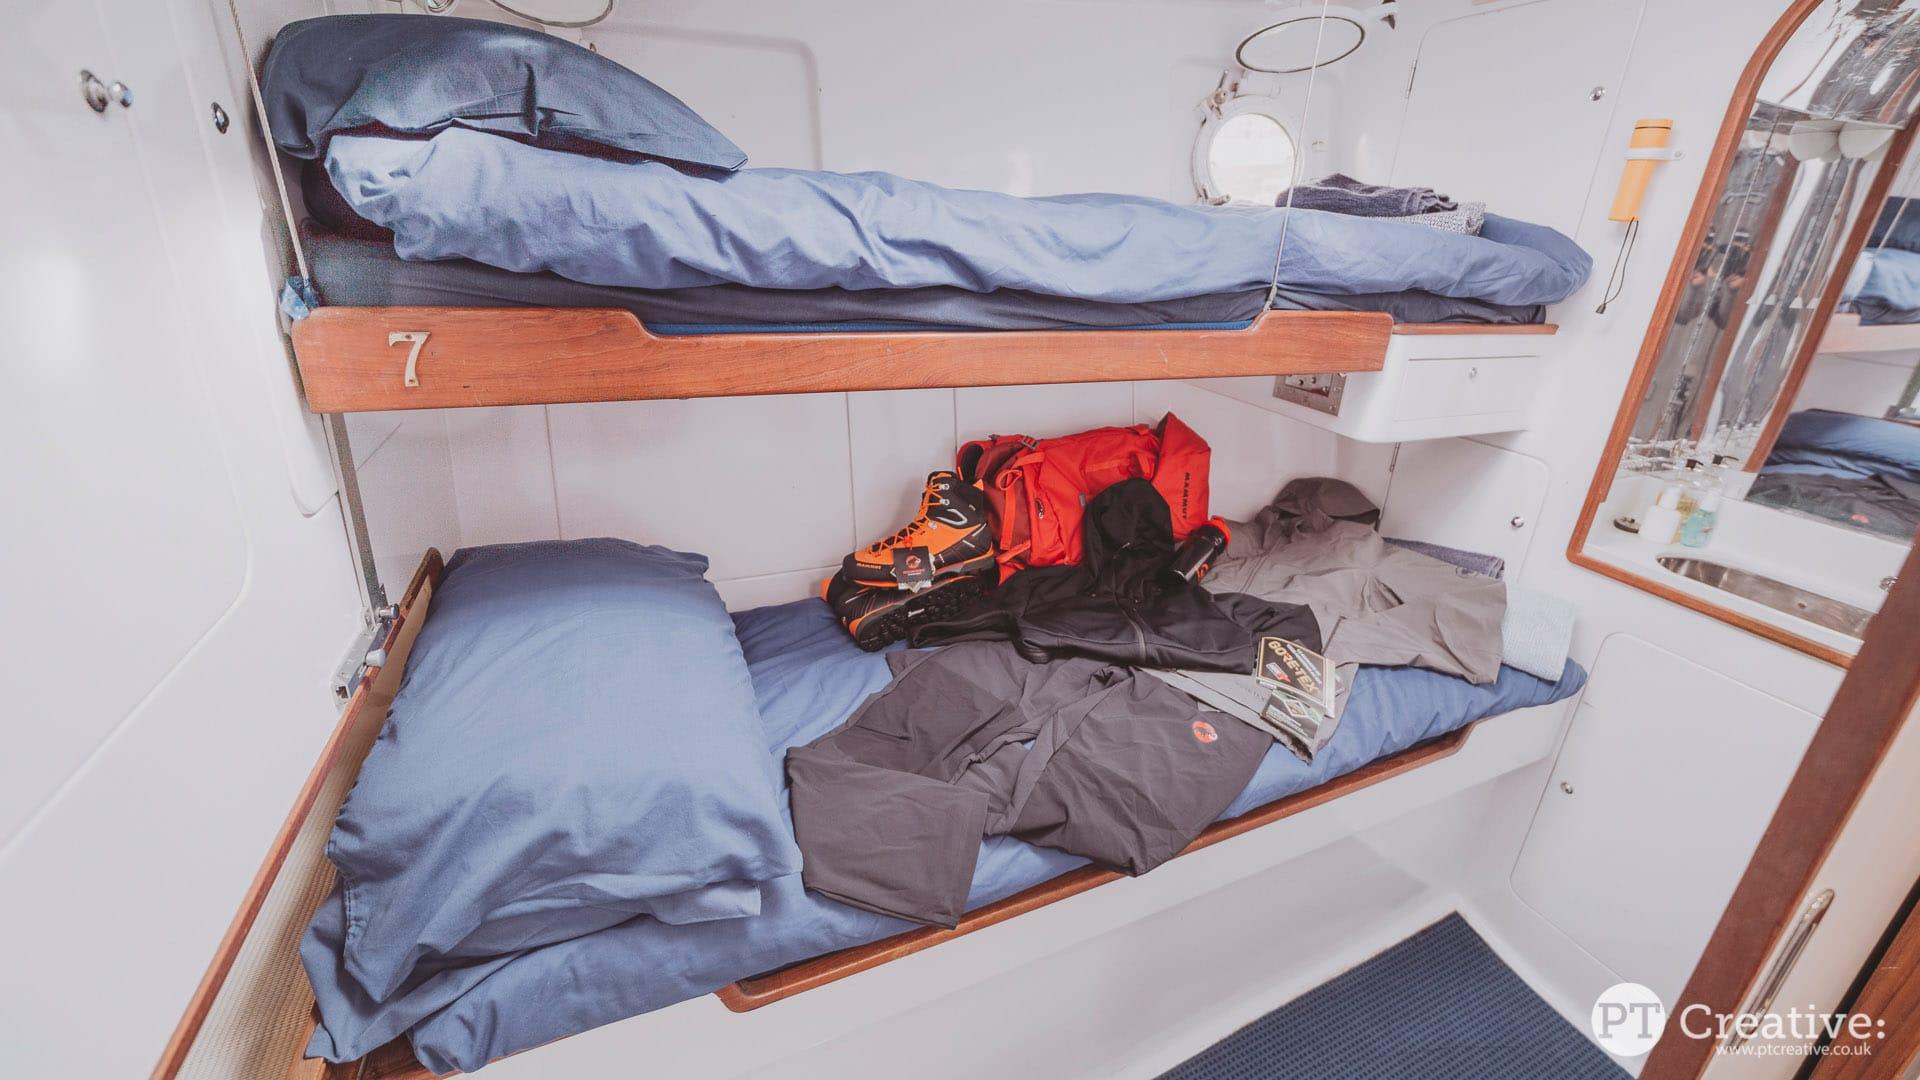 Trek and sail guest kit